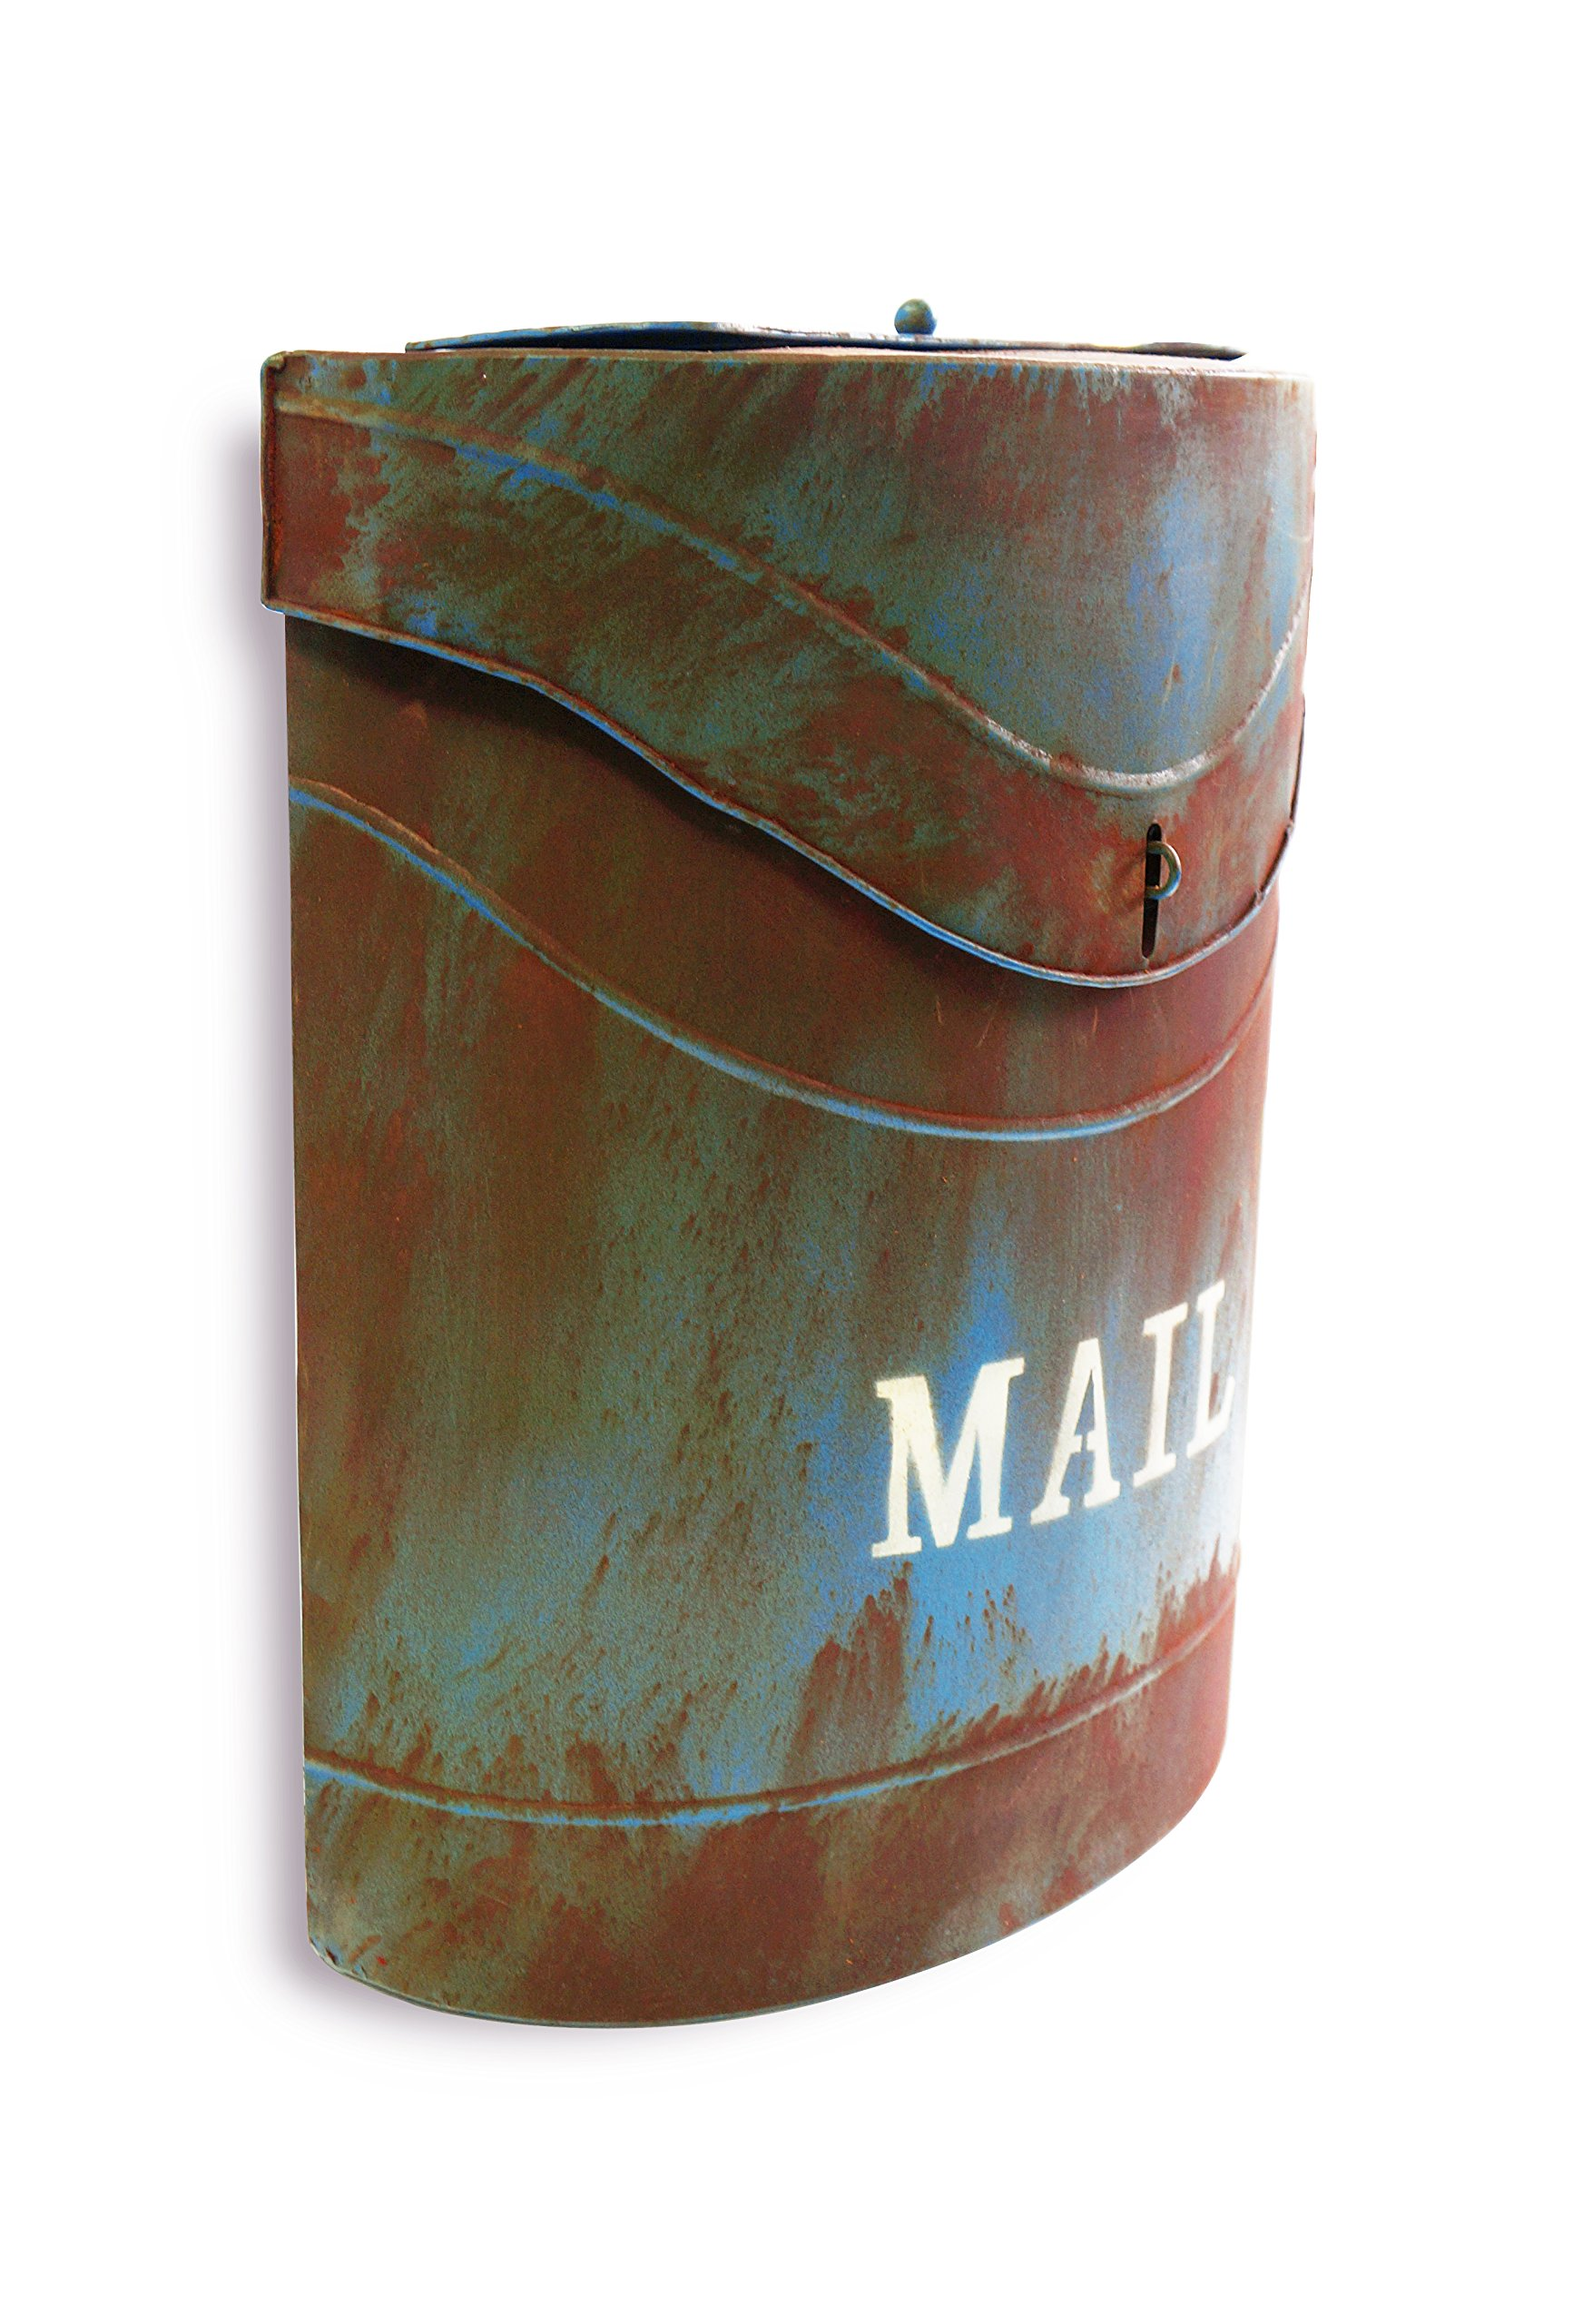 NACH FZ-M1001BLU Kinley MAIL Industrial Style Mailbox - Wall Mounted Post Box, Rustic Blue, 11.4 x 4.52 x 13.9 inch